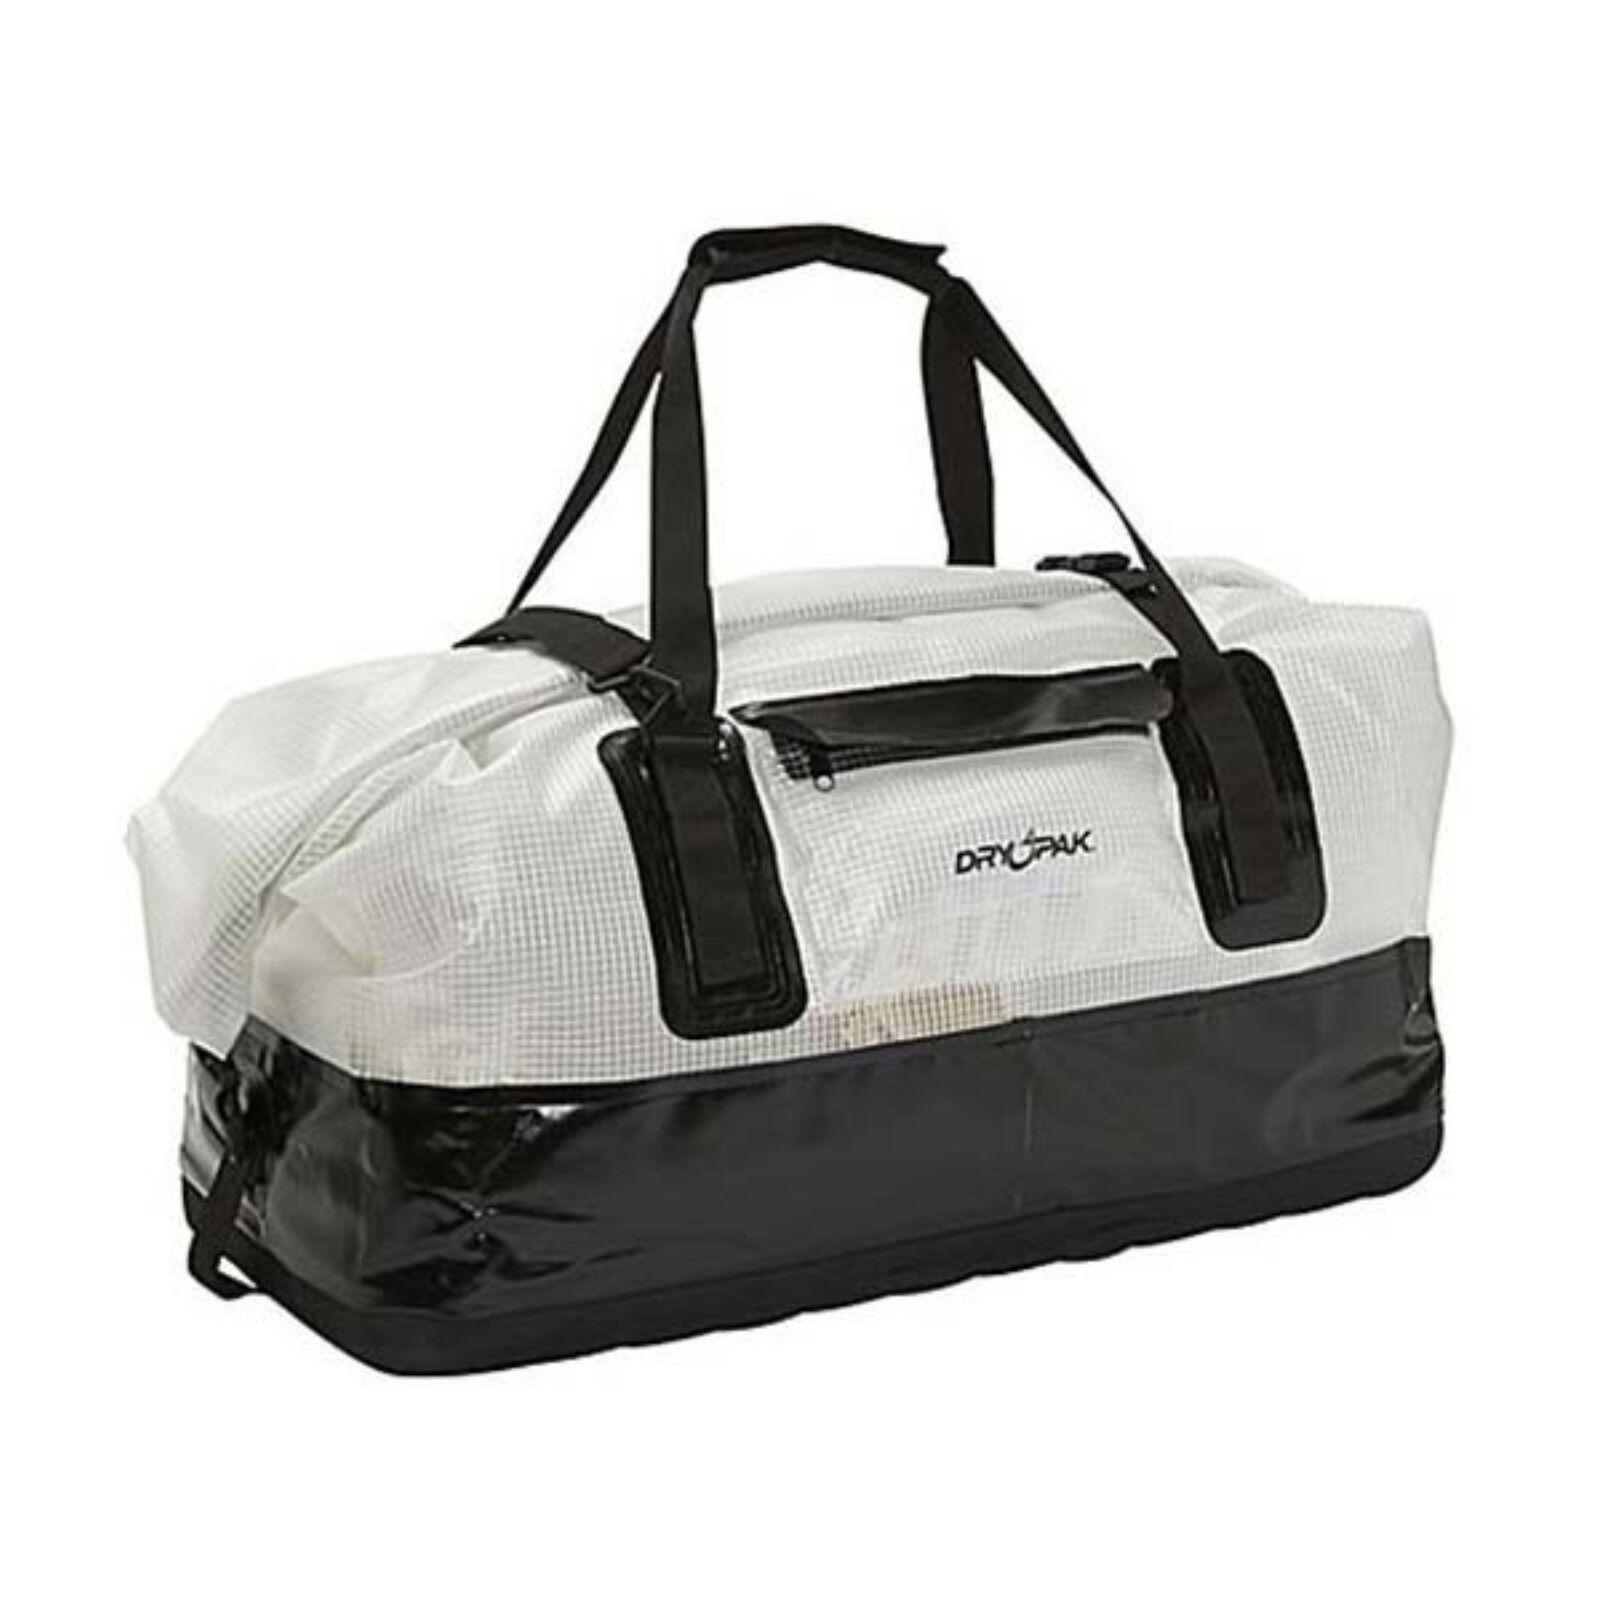 Kwik Tek DpD2Cl XLarge Clear Waterproof Duffle Bag